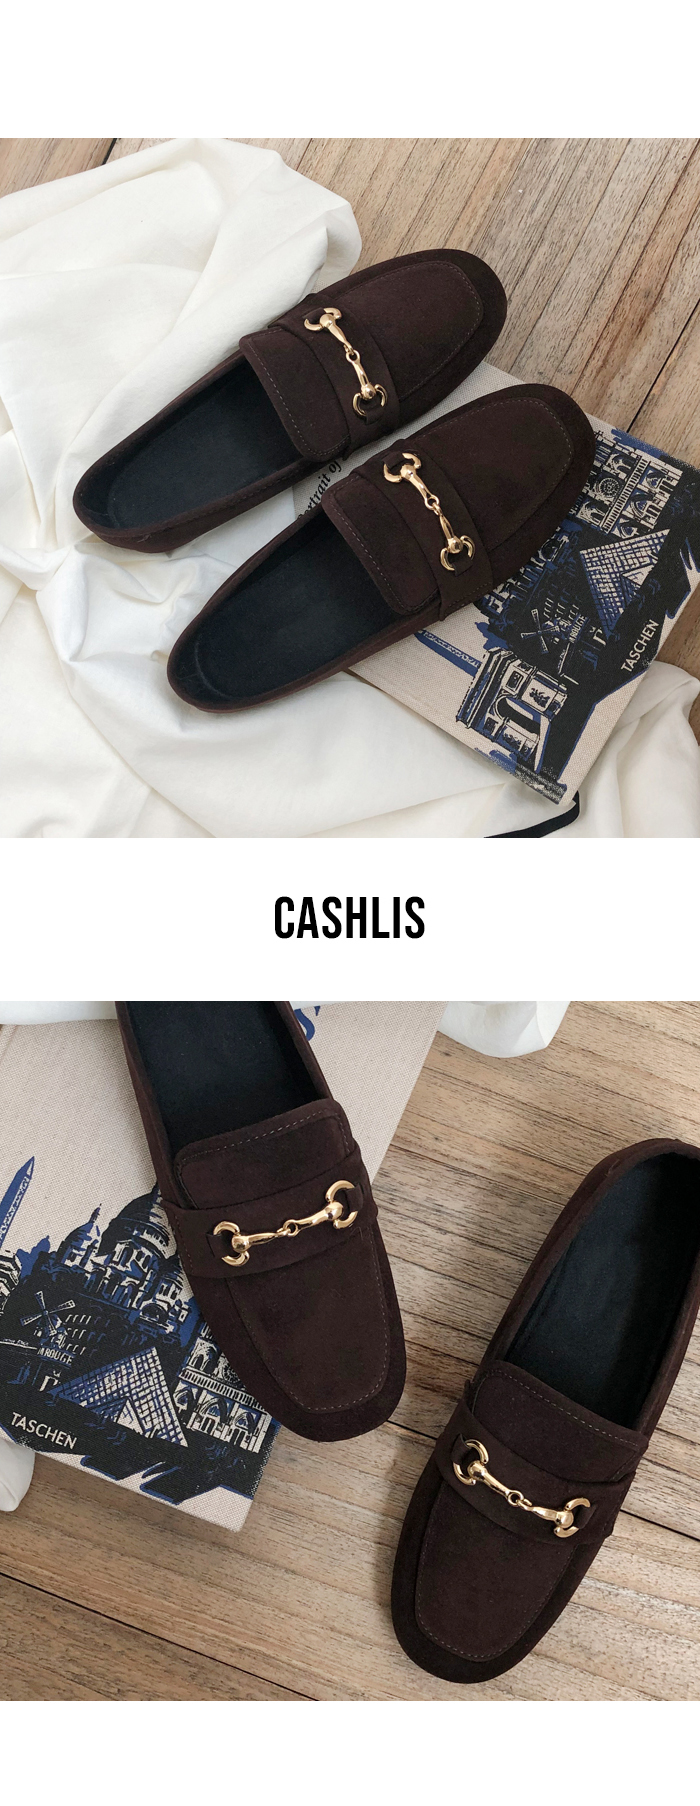 Cashless 2.5cm